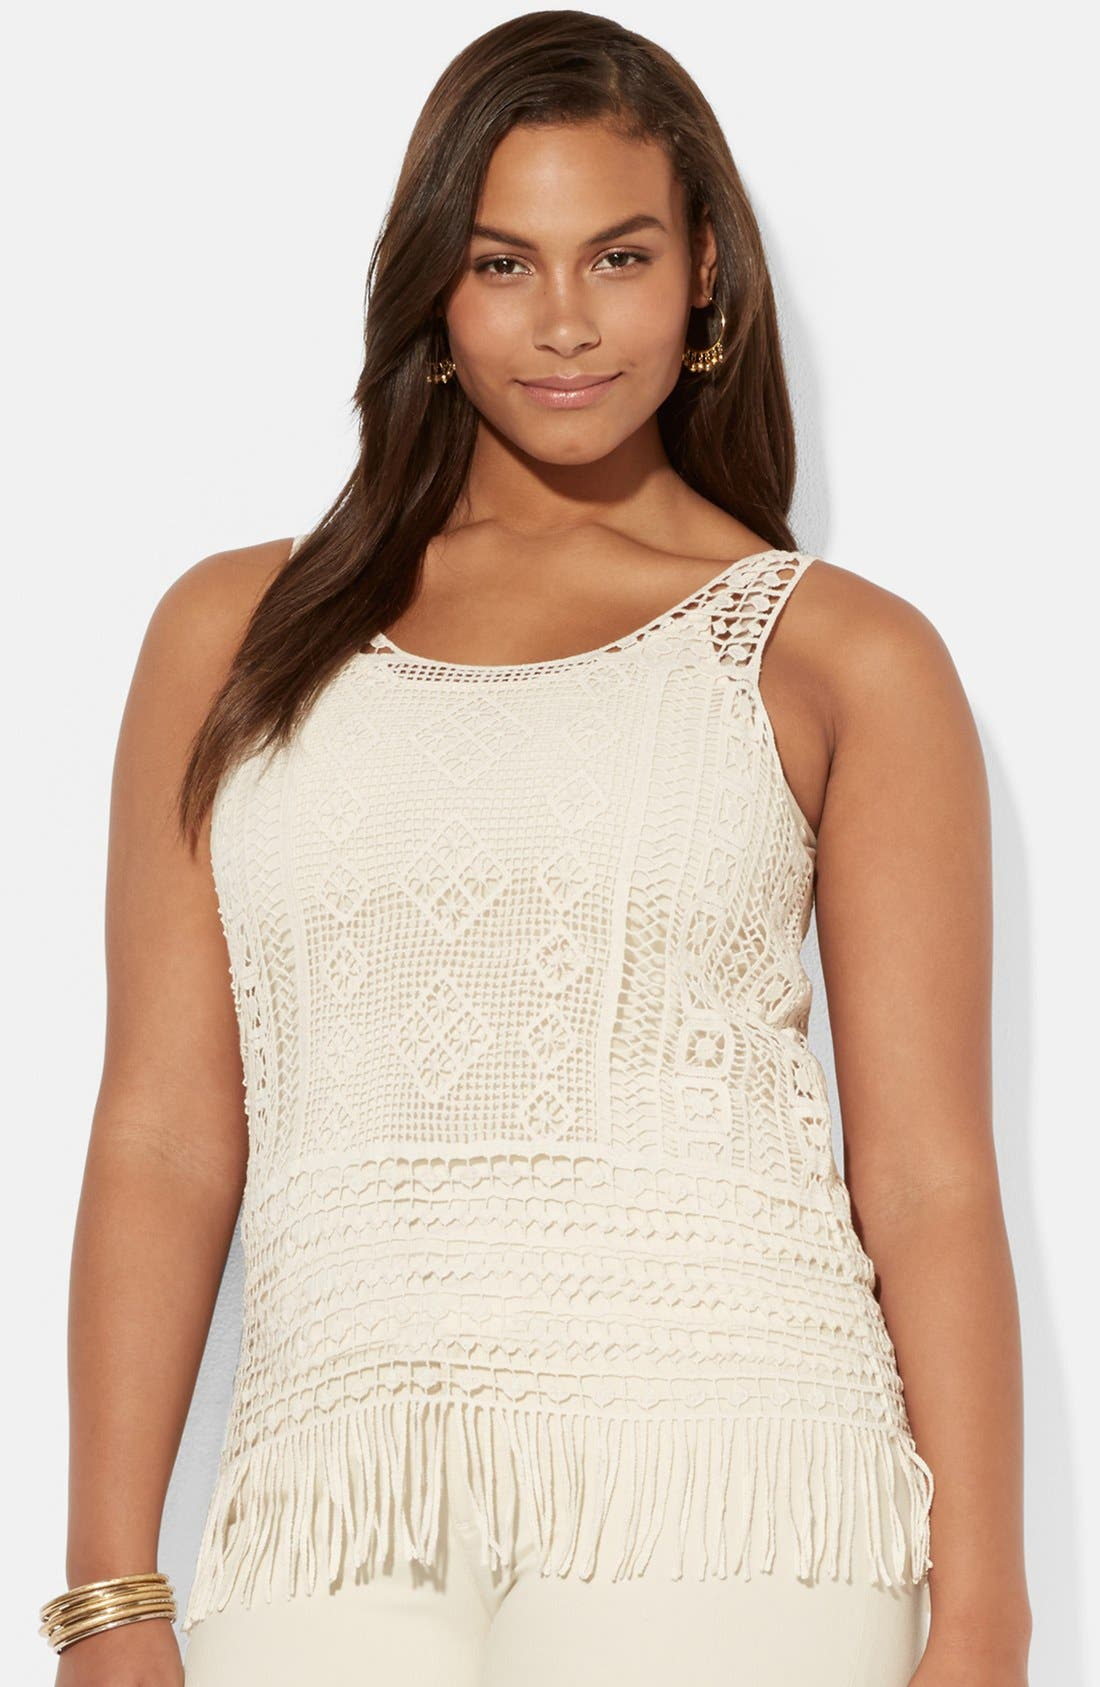 Main Image - Lauren Ralph Lauren Fringed Cotton Crochet Tank with Camisole (Plus Size)